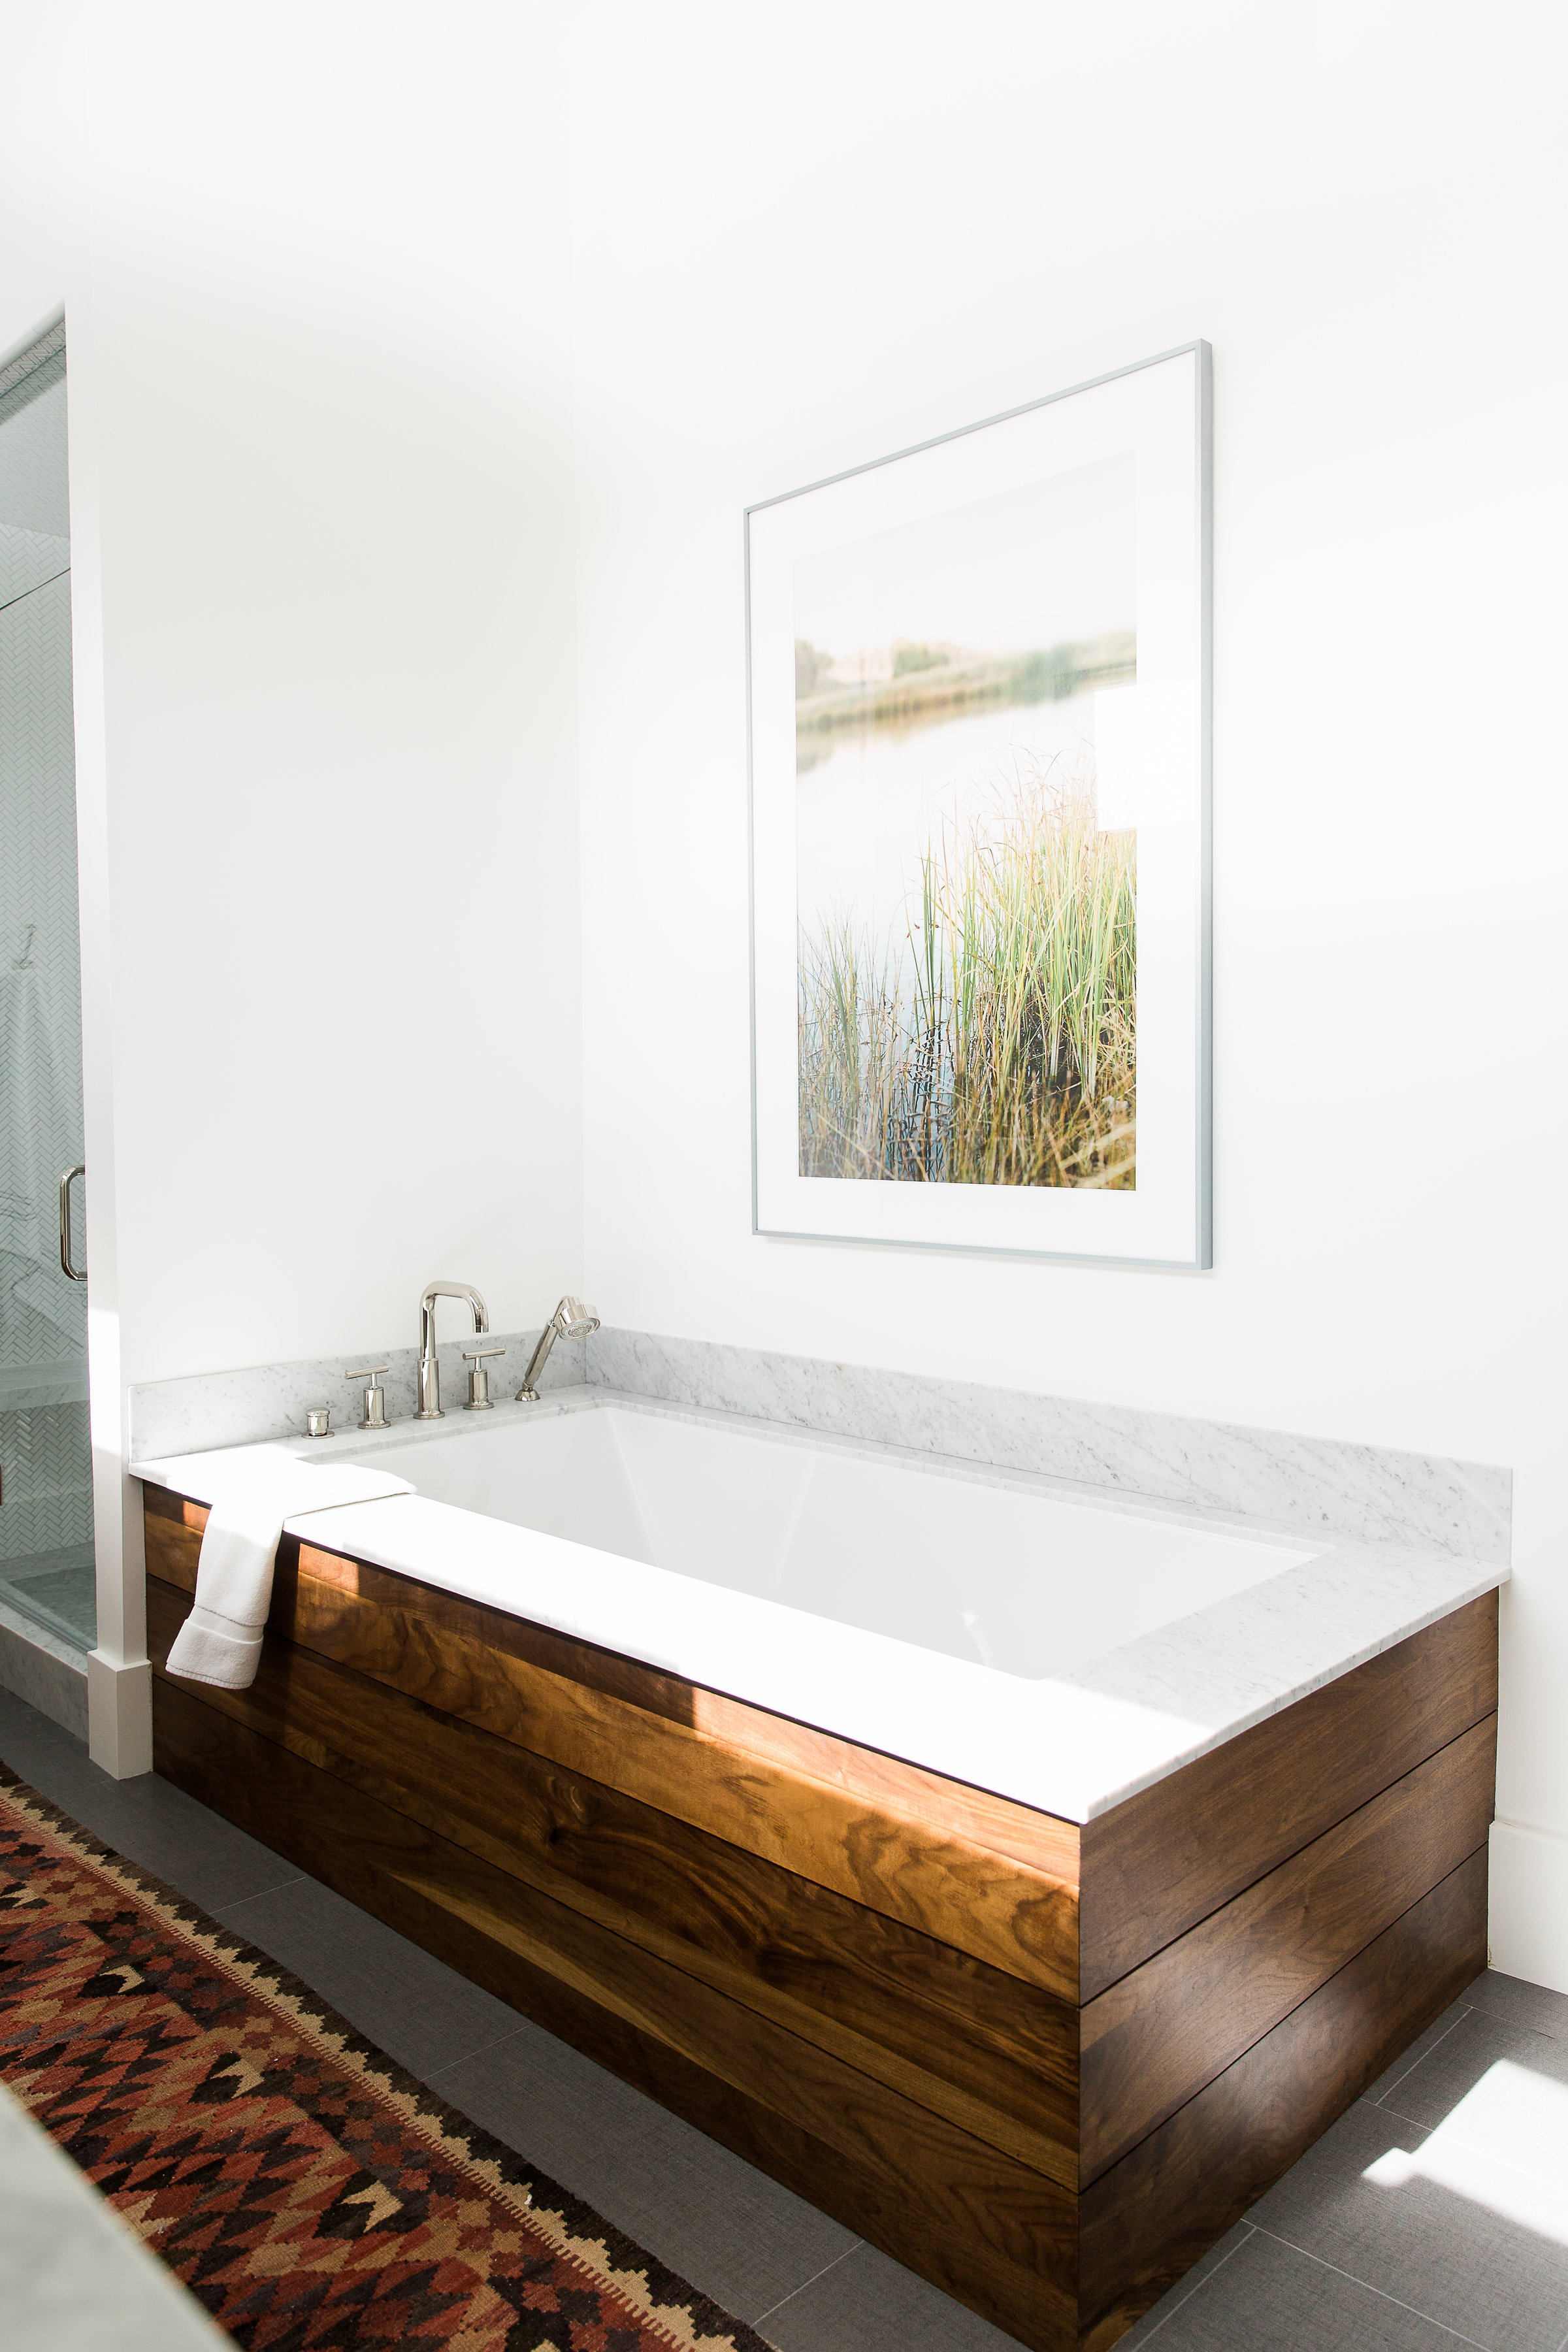 Wood planking around bathtub || Studio McGee